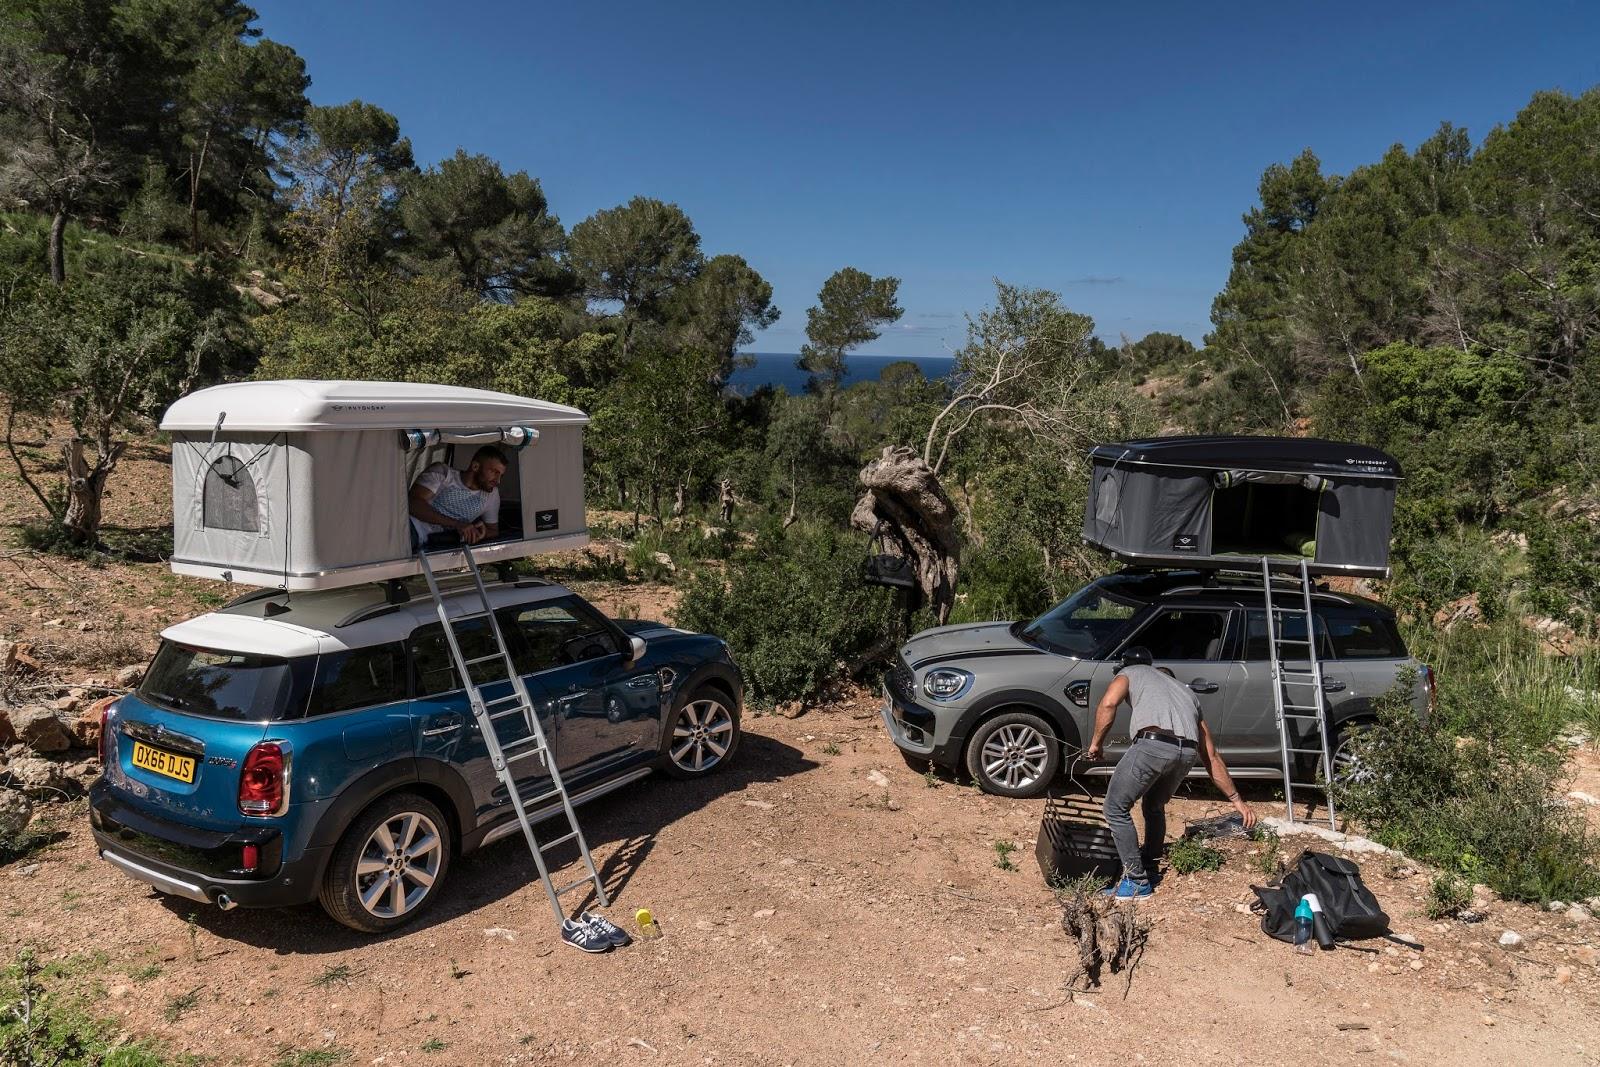 P90258017 highRes the autohome roof te Το MINI Countryman έχει και... σκηνή οροφής Mini, MINI Cooper Countryman, SUV